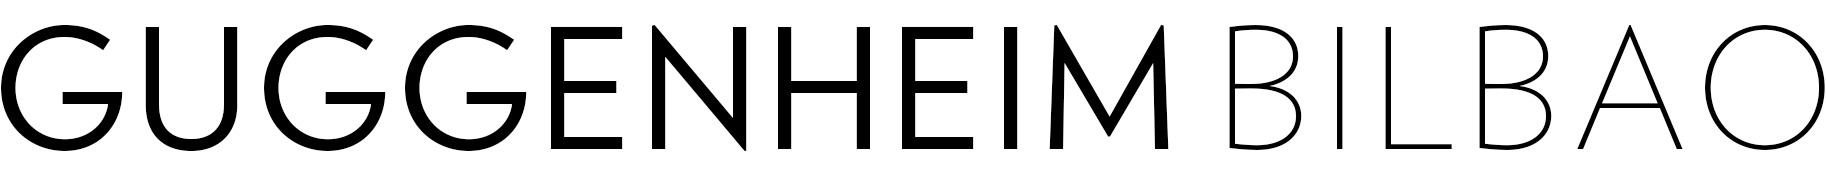 guggenheim bilbao logo